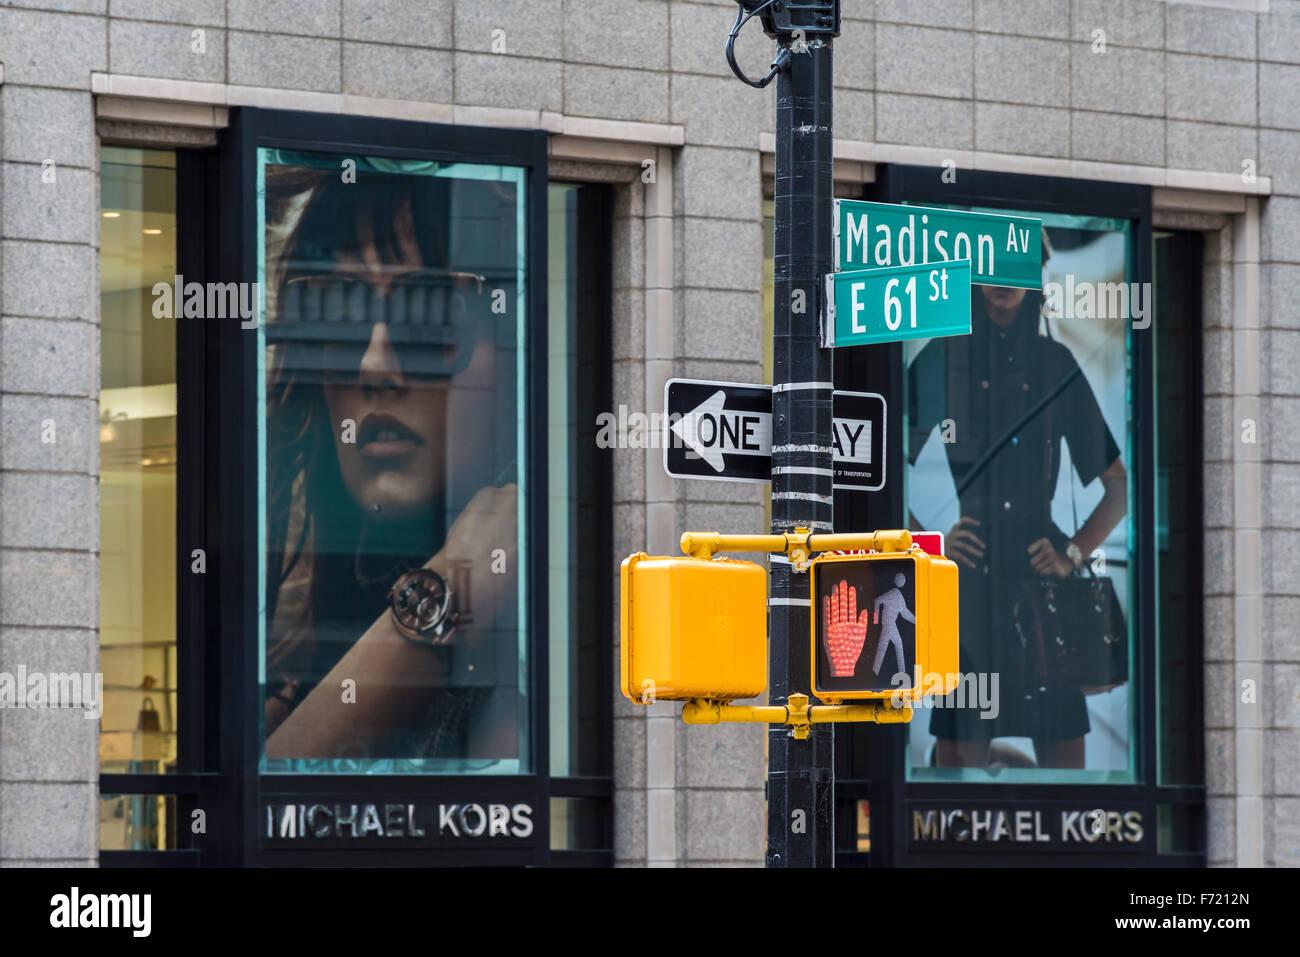 Madison Avenue street sign and fashion shop behind, Manhattan, New York, USA - Stock Image